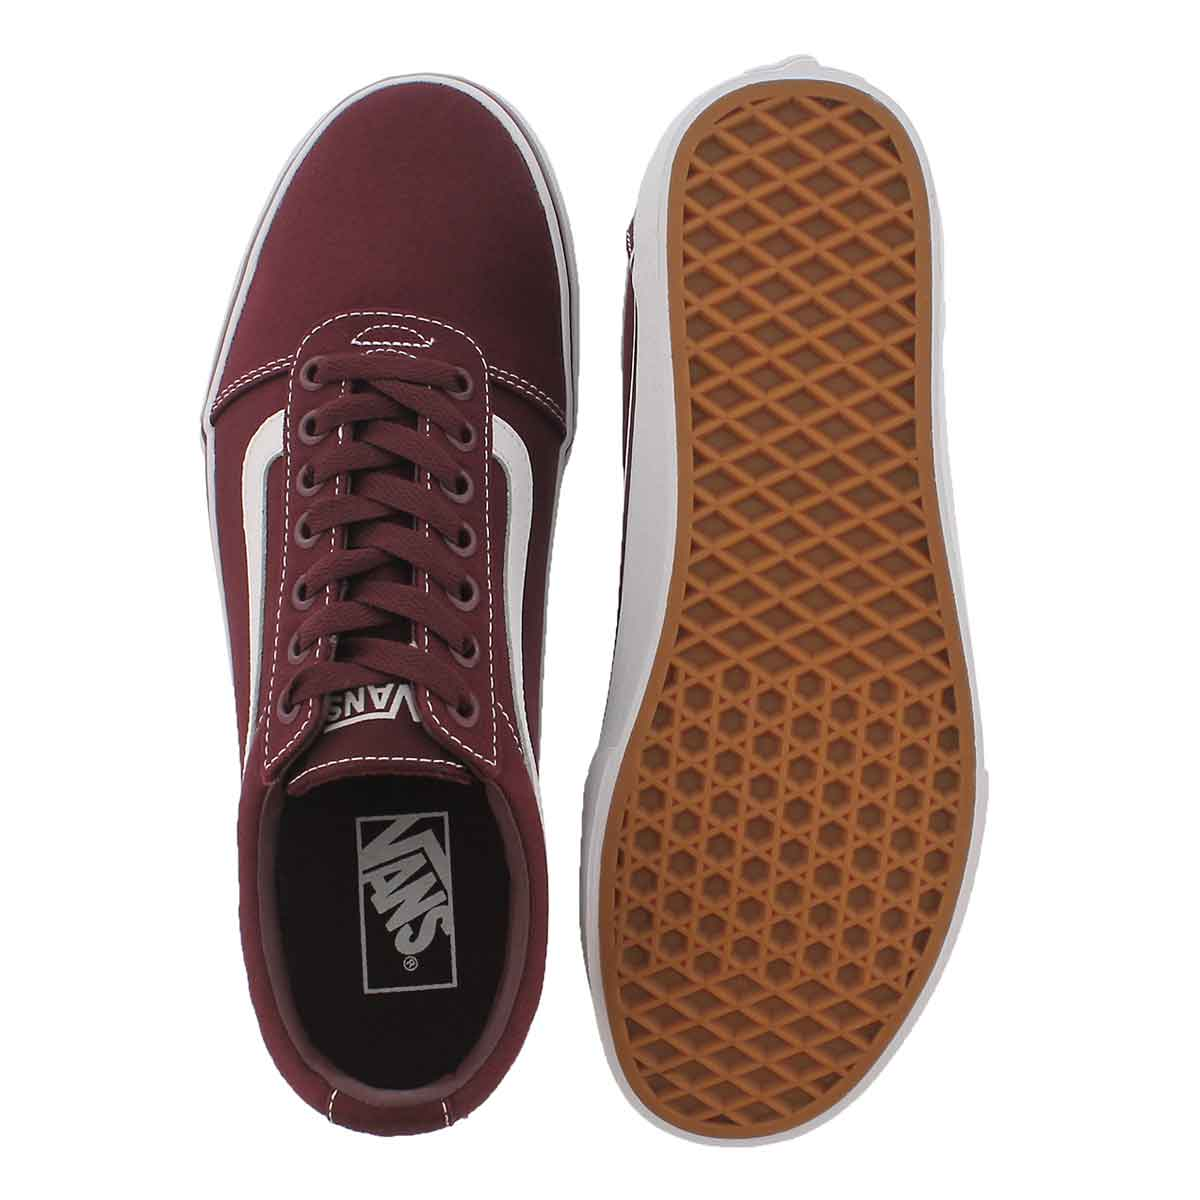 Men's Ward Sneaker - Port Royale/White